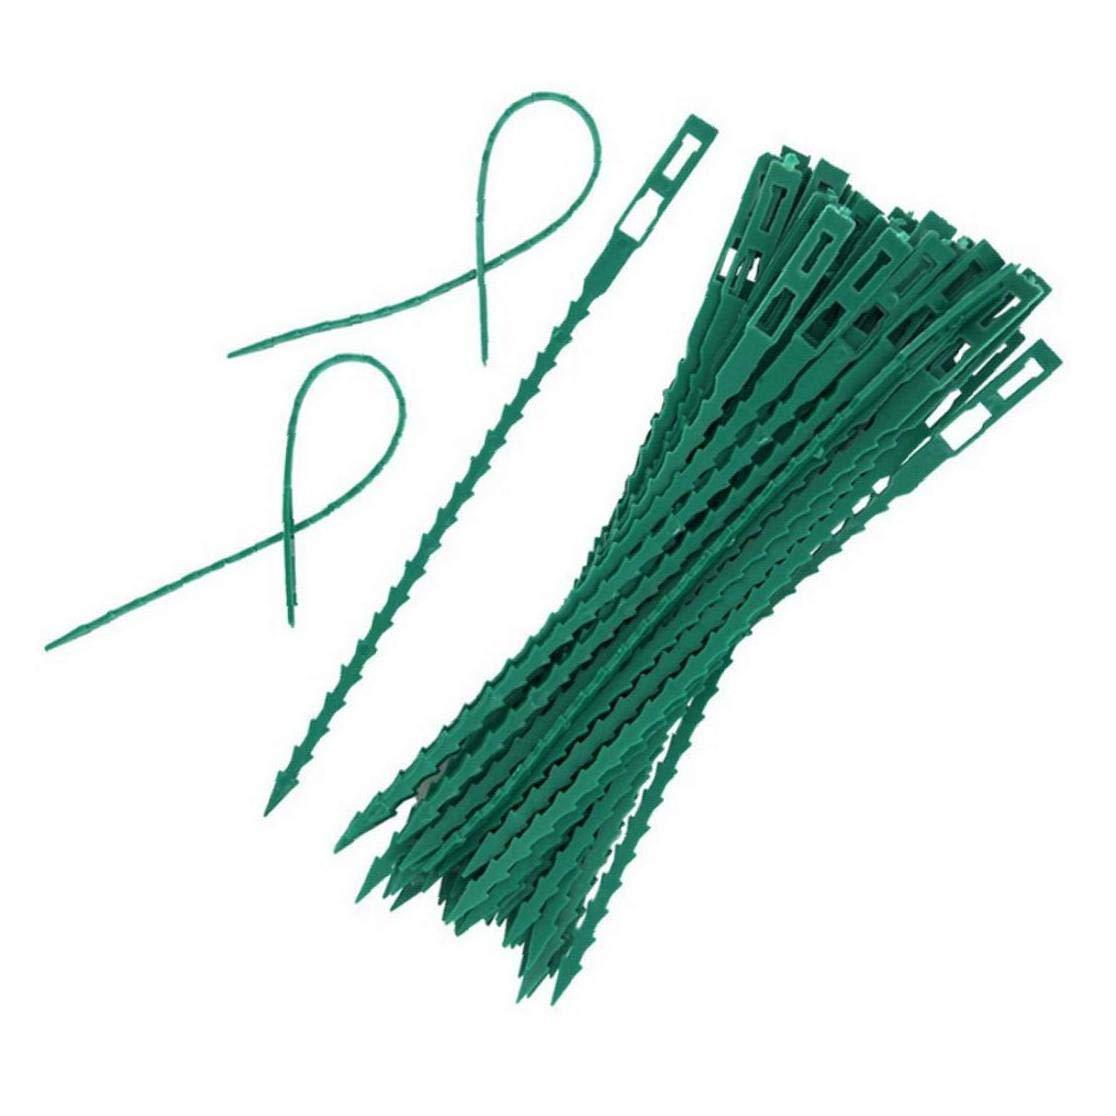 XKJFZ 50pcs Ajustable De Torsi/ón Planta De Jard/ín De Pl/ástico Flexible De Las Ataduras De Cables Tira De Alambre para Planta De Jard/ín Sujetador Asegurar Verde